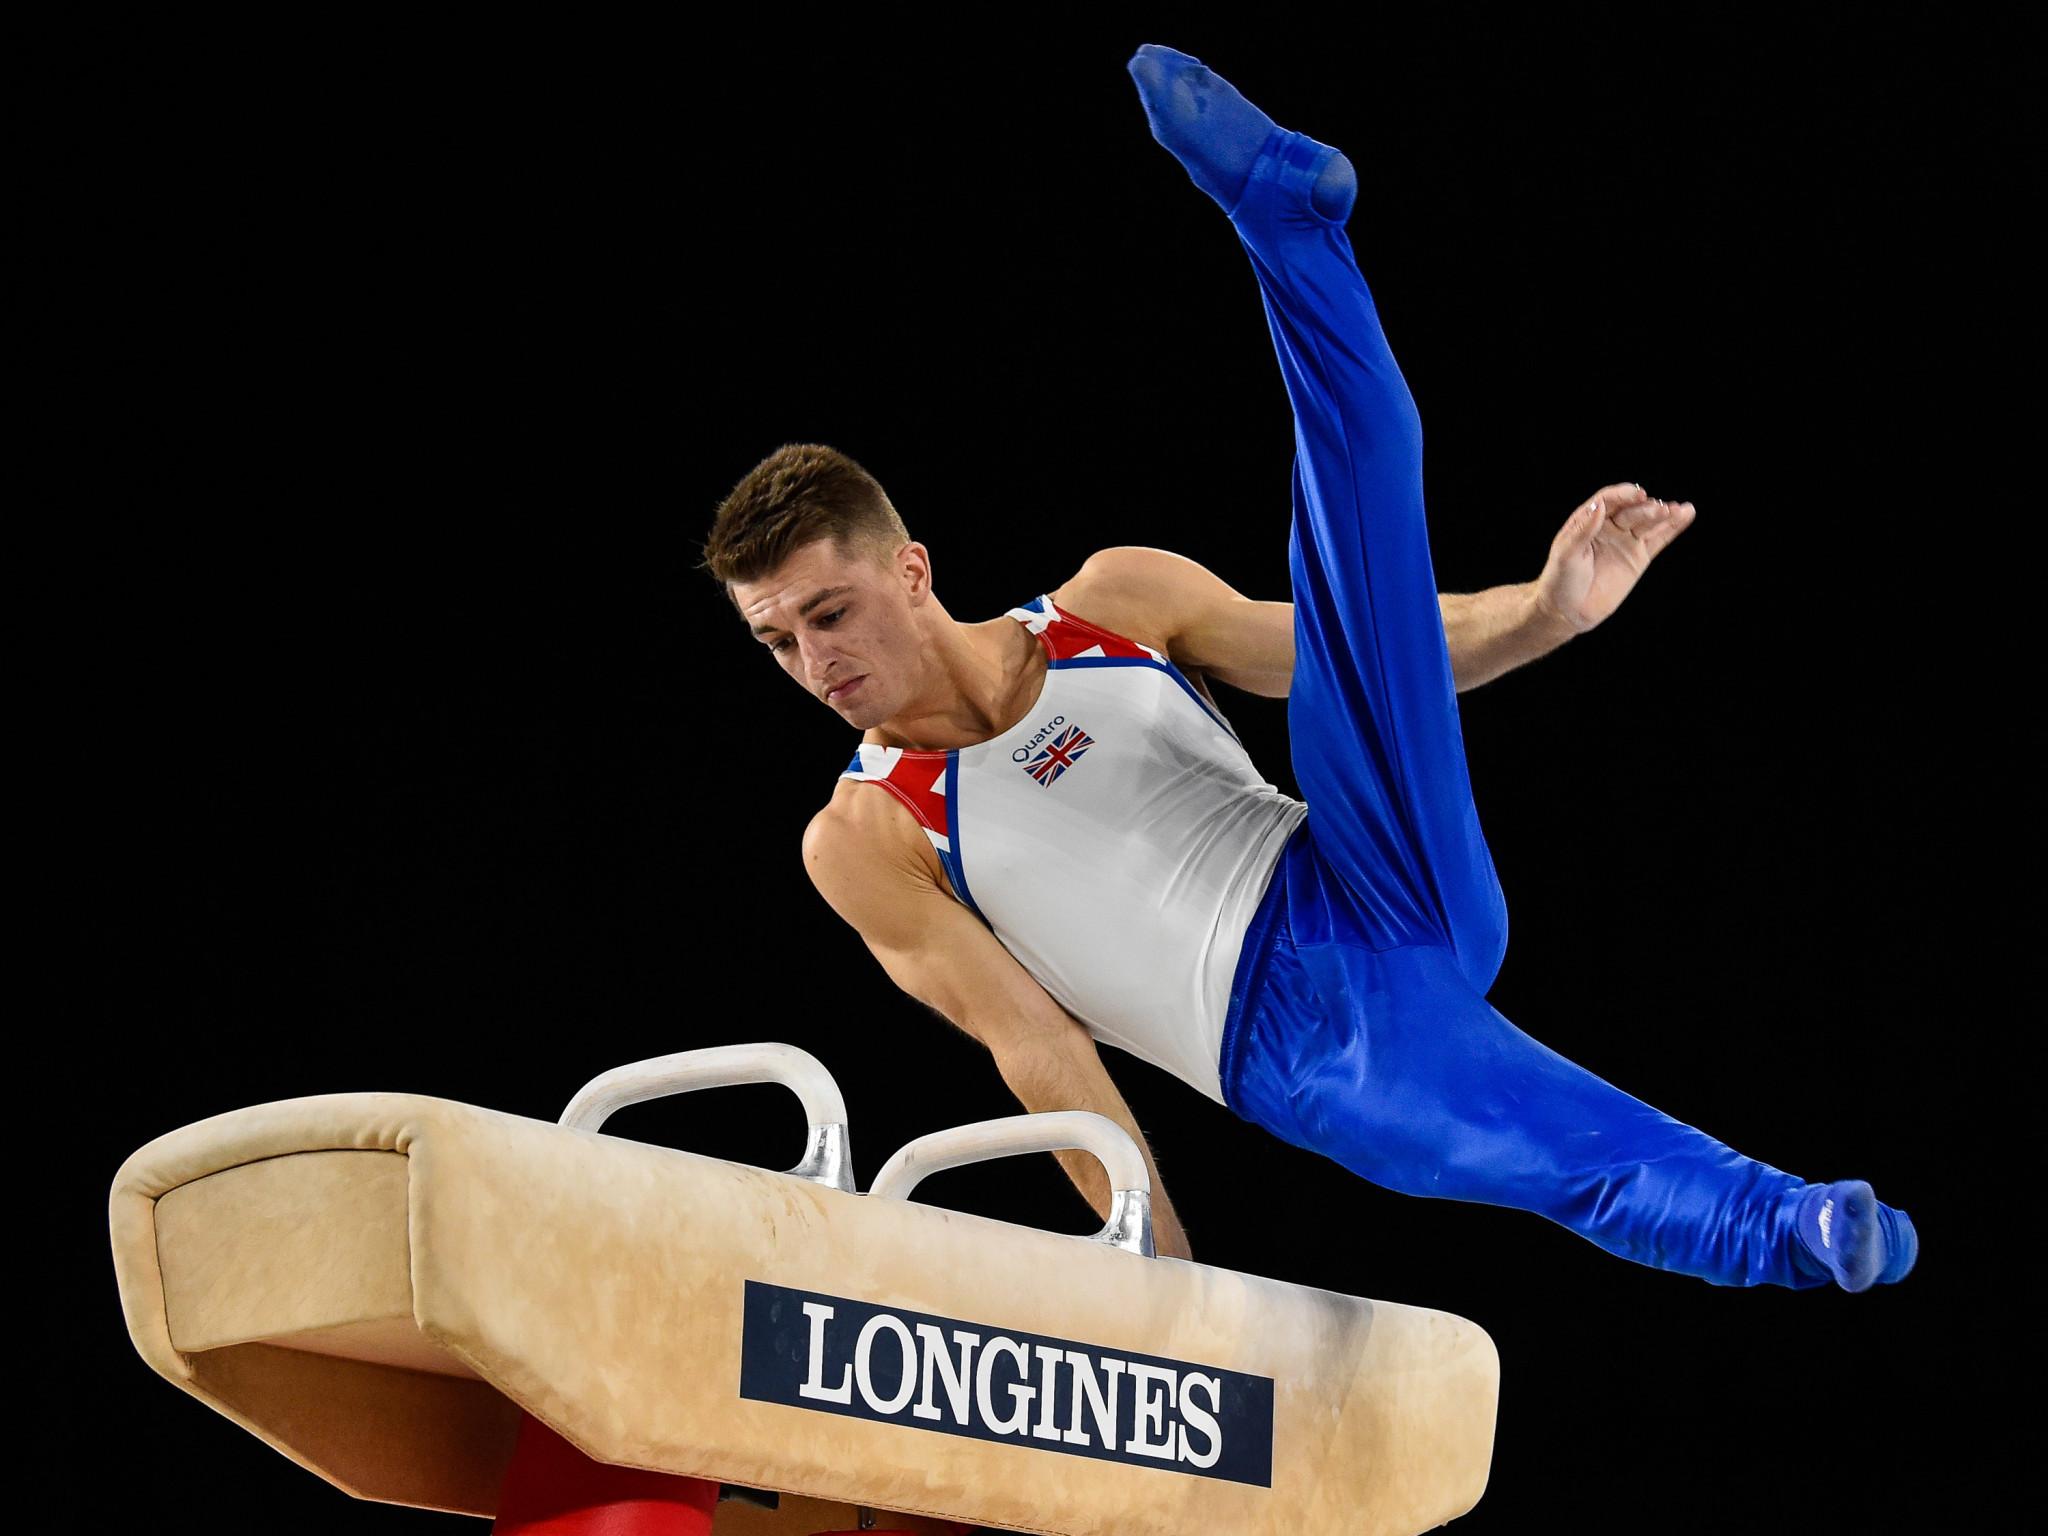 Defending champions strike gold again at Artistic Gymnastics World Championships